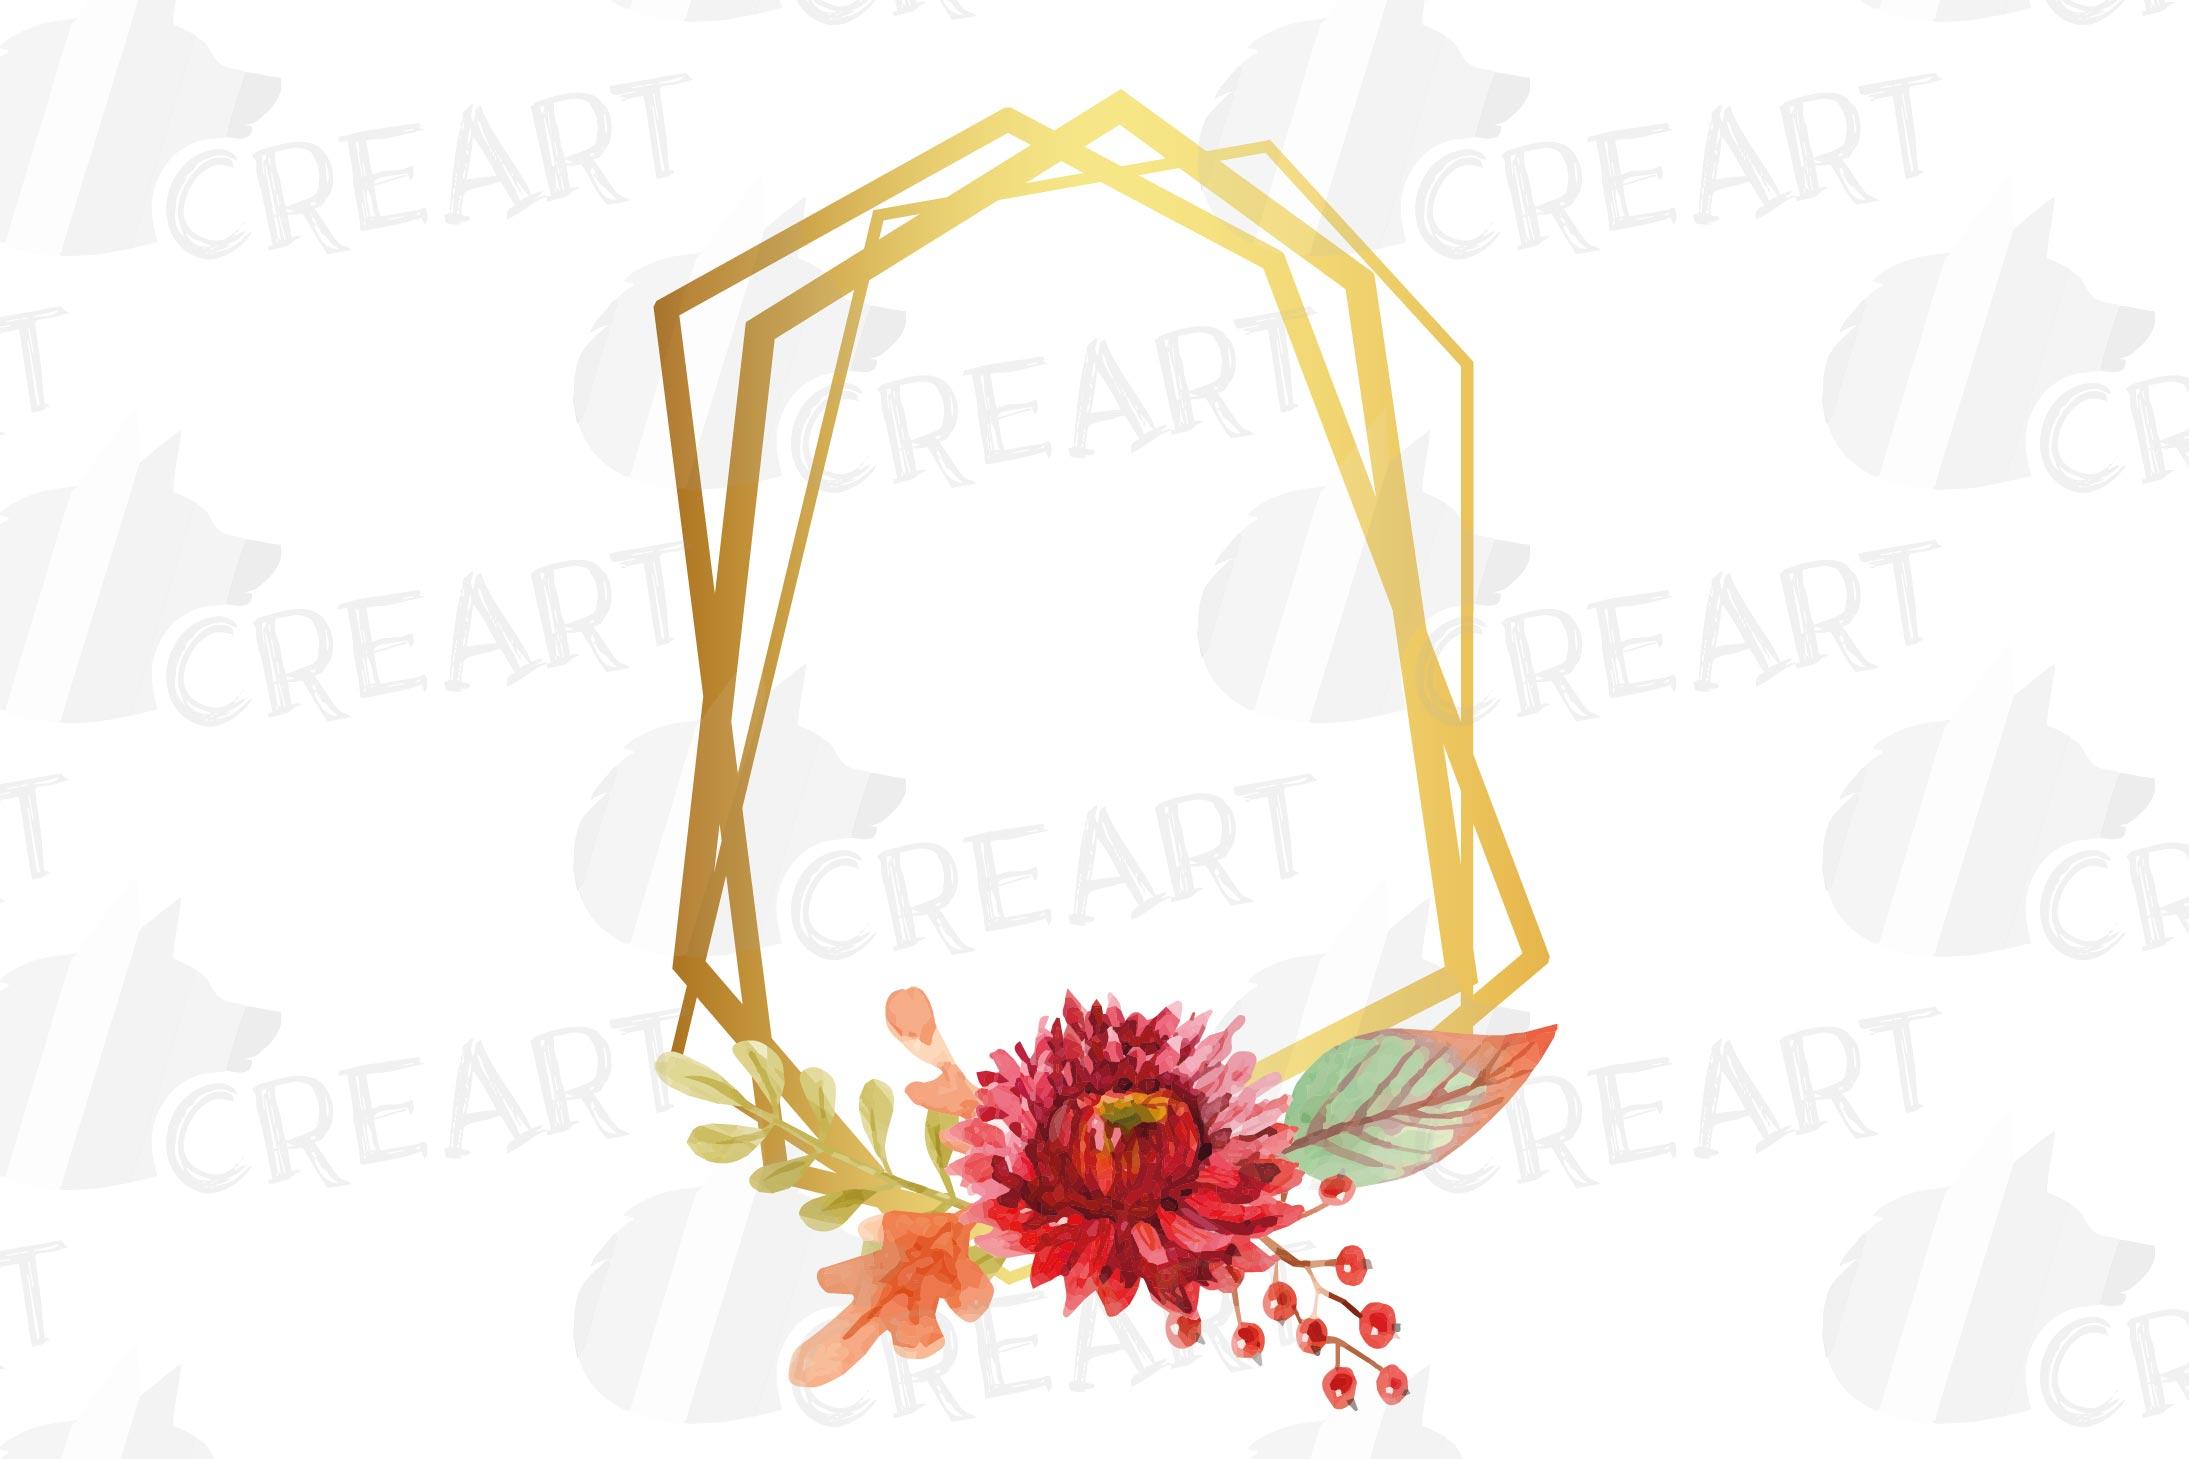 Watercolor elegant autumn geometric golden frame templates. example image 9